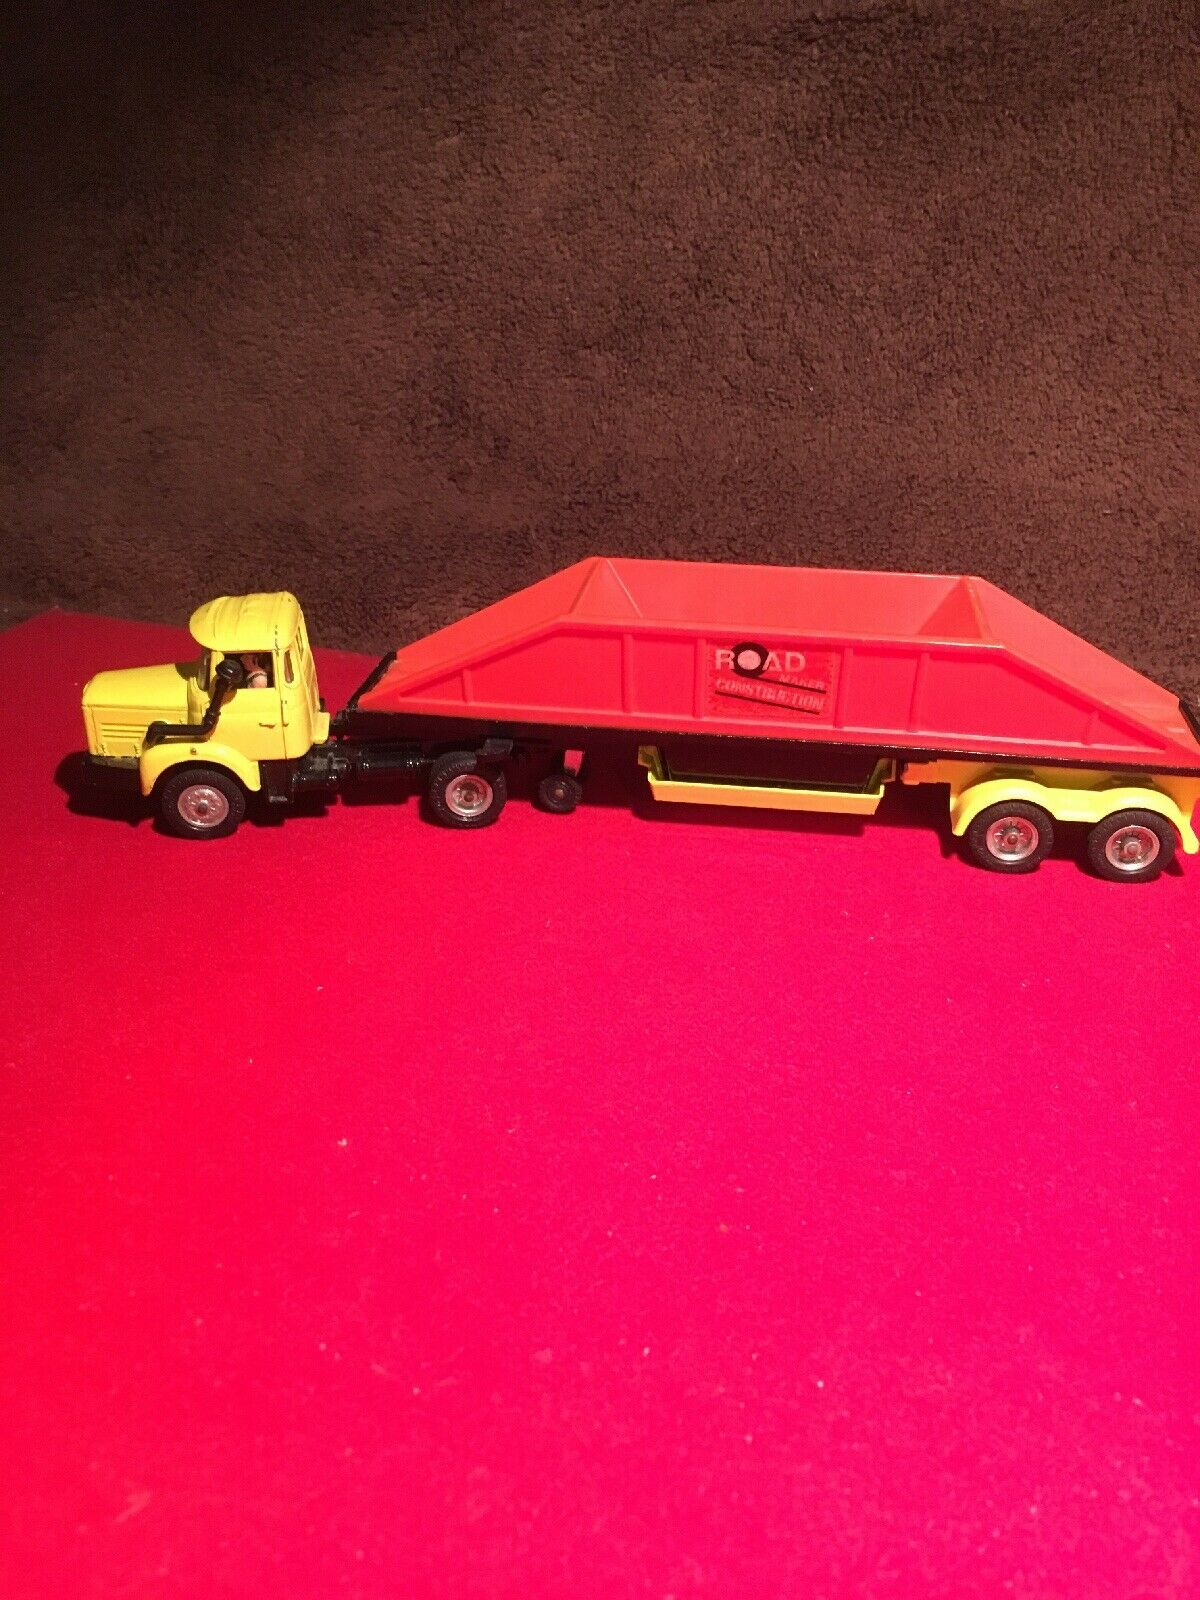 Corgi Berliet  Road Maker Construction Truck  (Vintage 1970's)